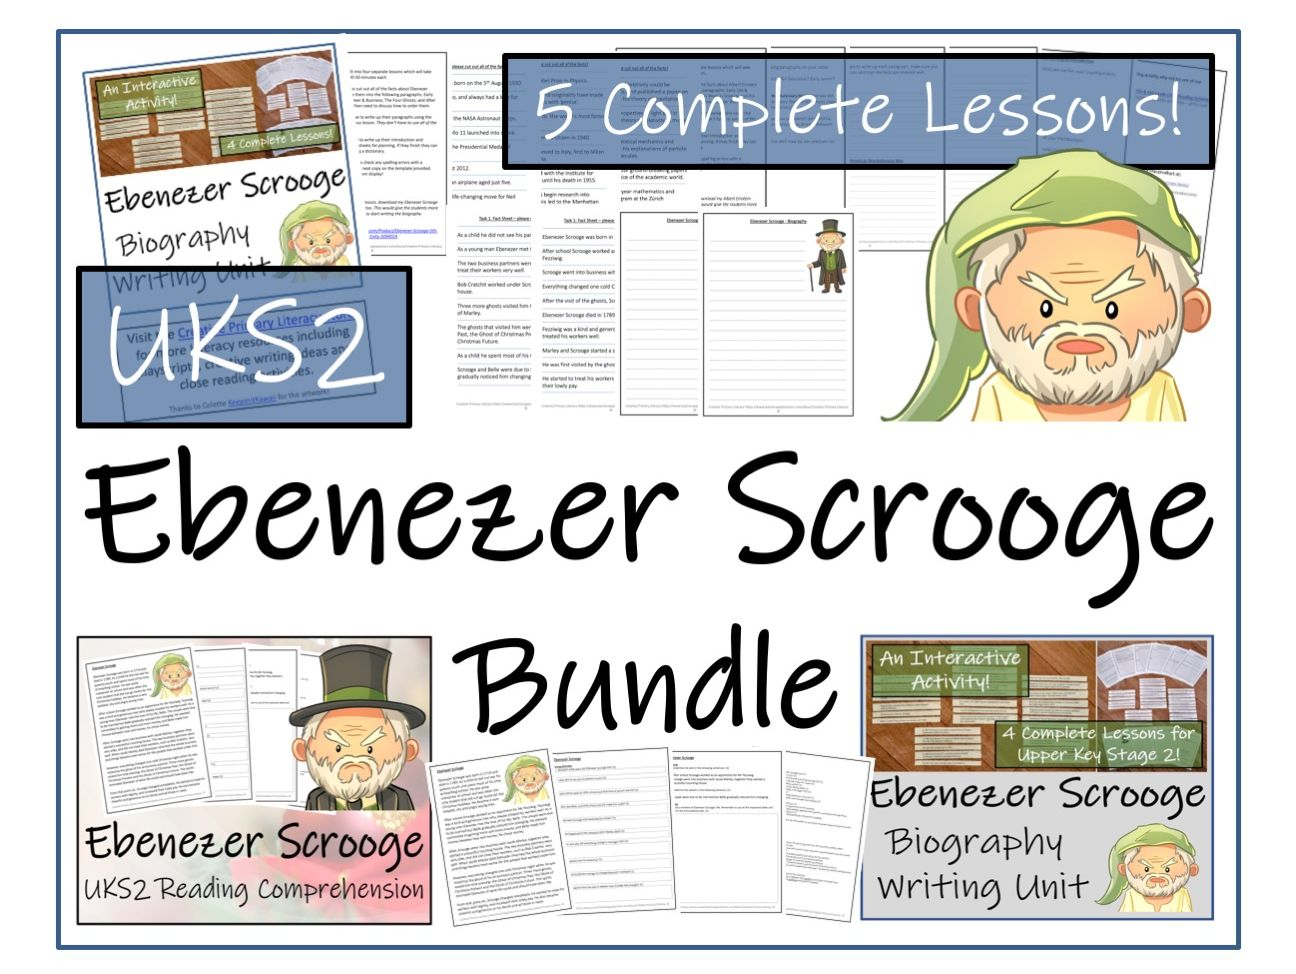 UKS2 Literacy - Ebenezer Scrooge Reading Comprehension & Biography Bundle